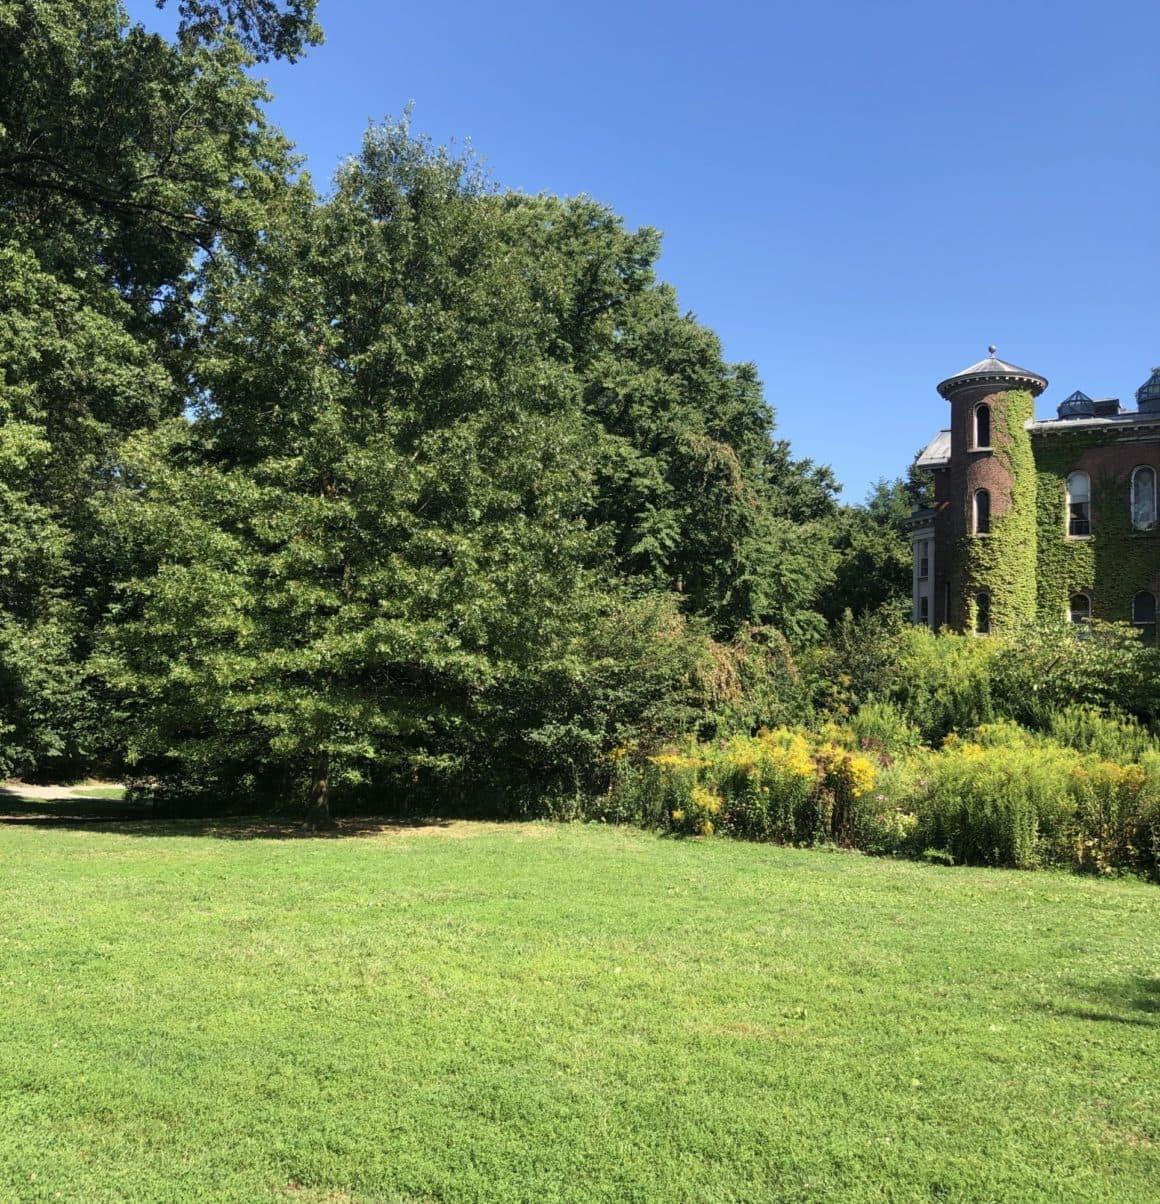 8 Best NYC Parks to Enjoy on Sunny Days